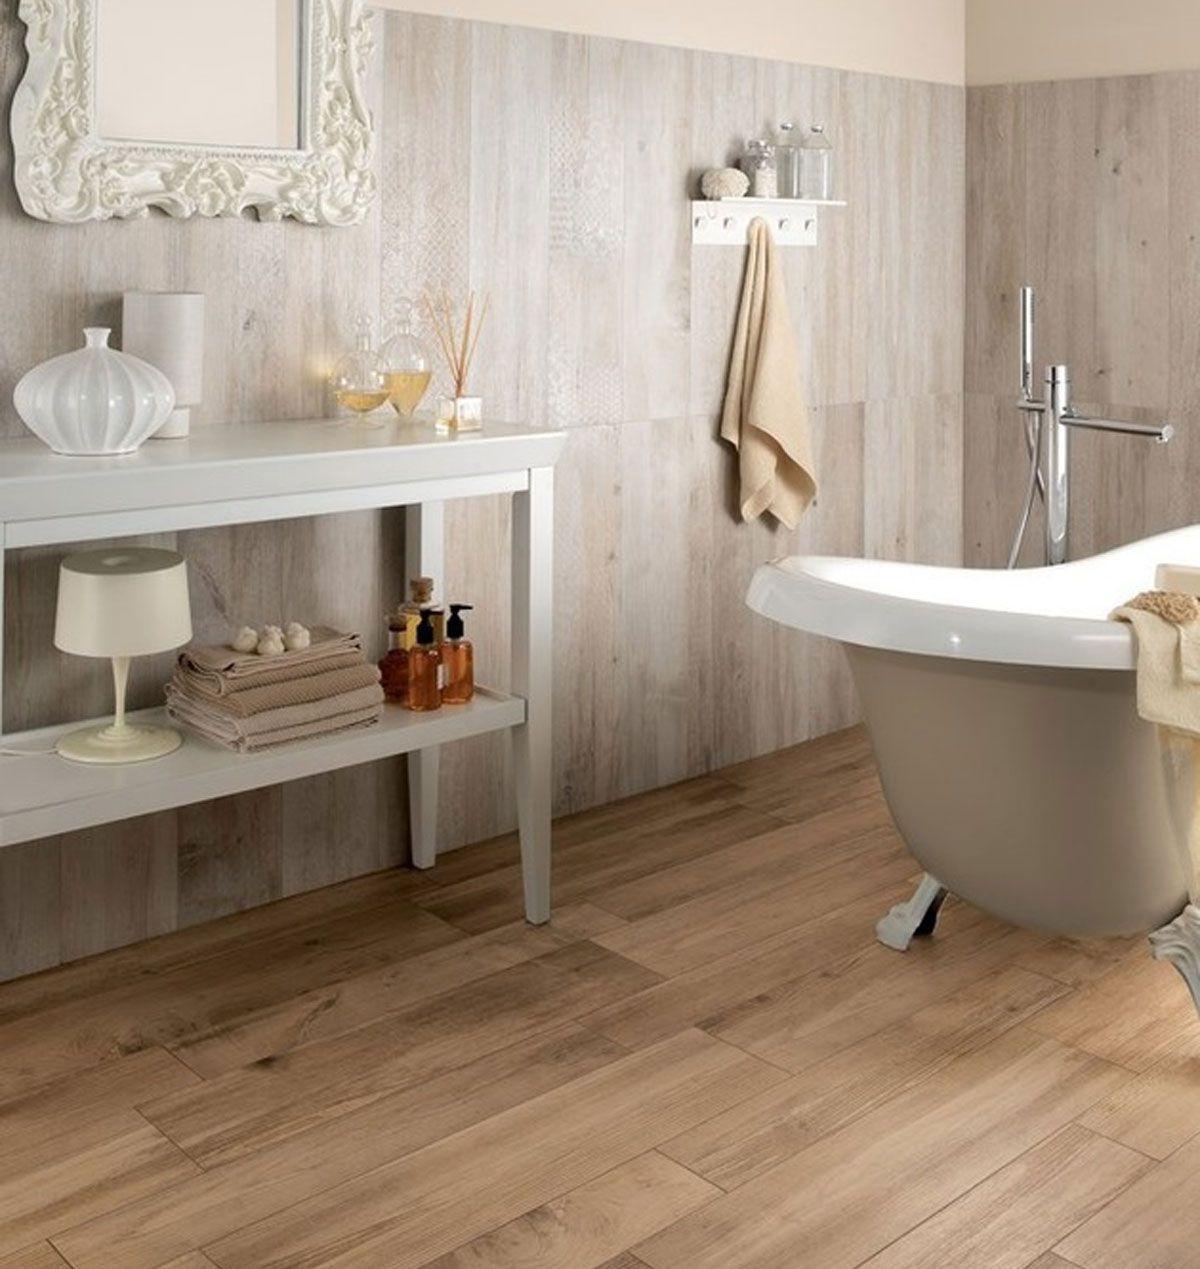 Bathroom Mirror Za podovi za kucu - google search   bad   pinterest   google search